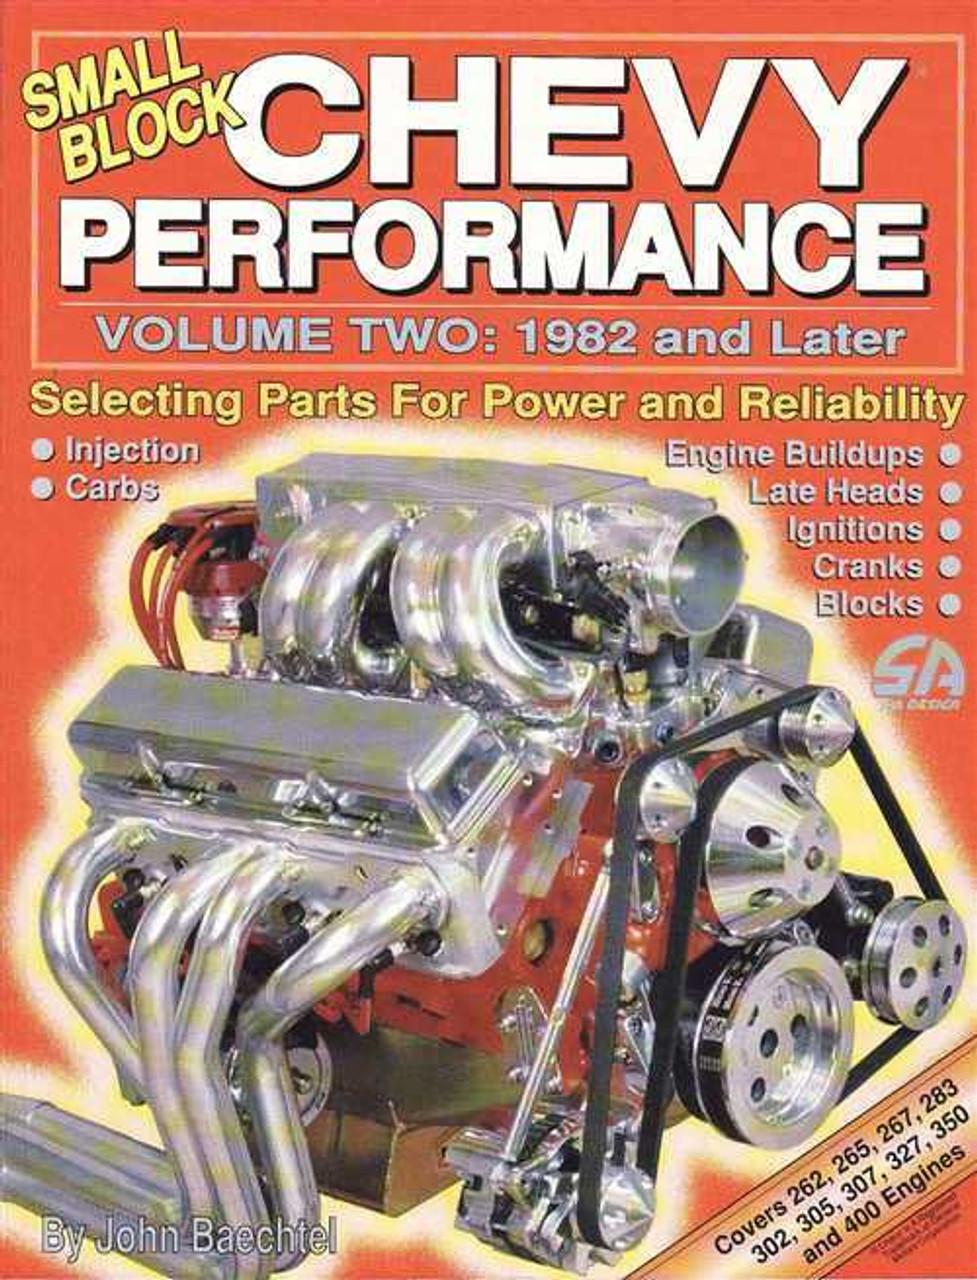 Small Block Chevy Performance Vol 2